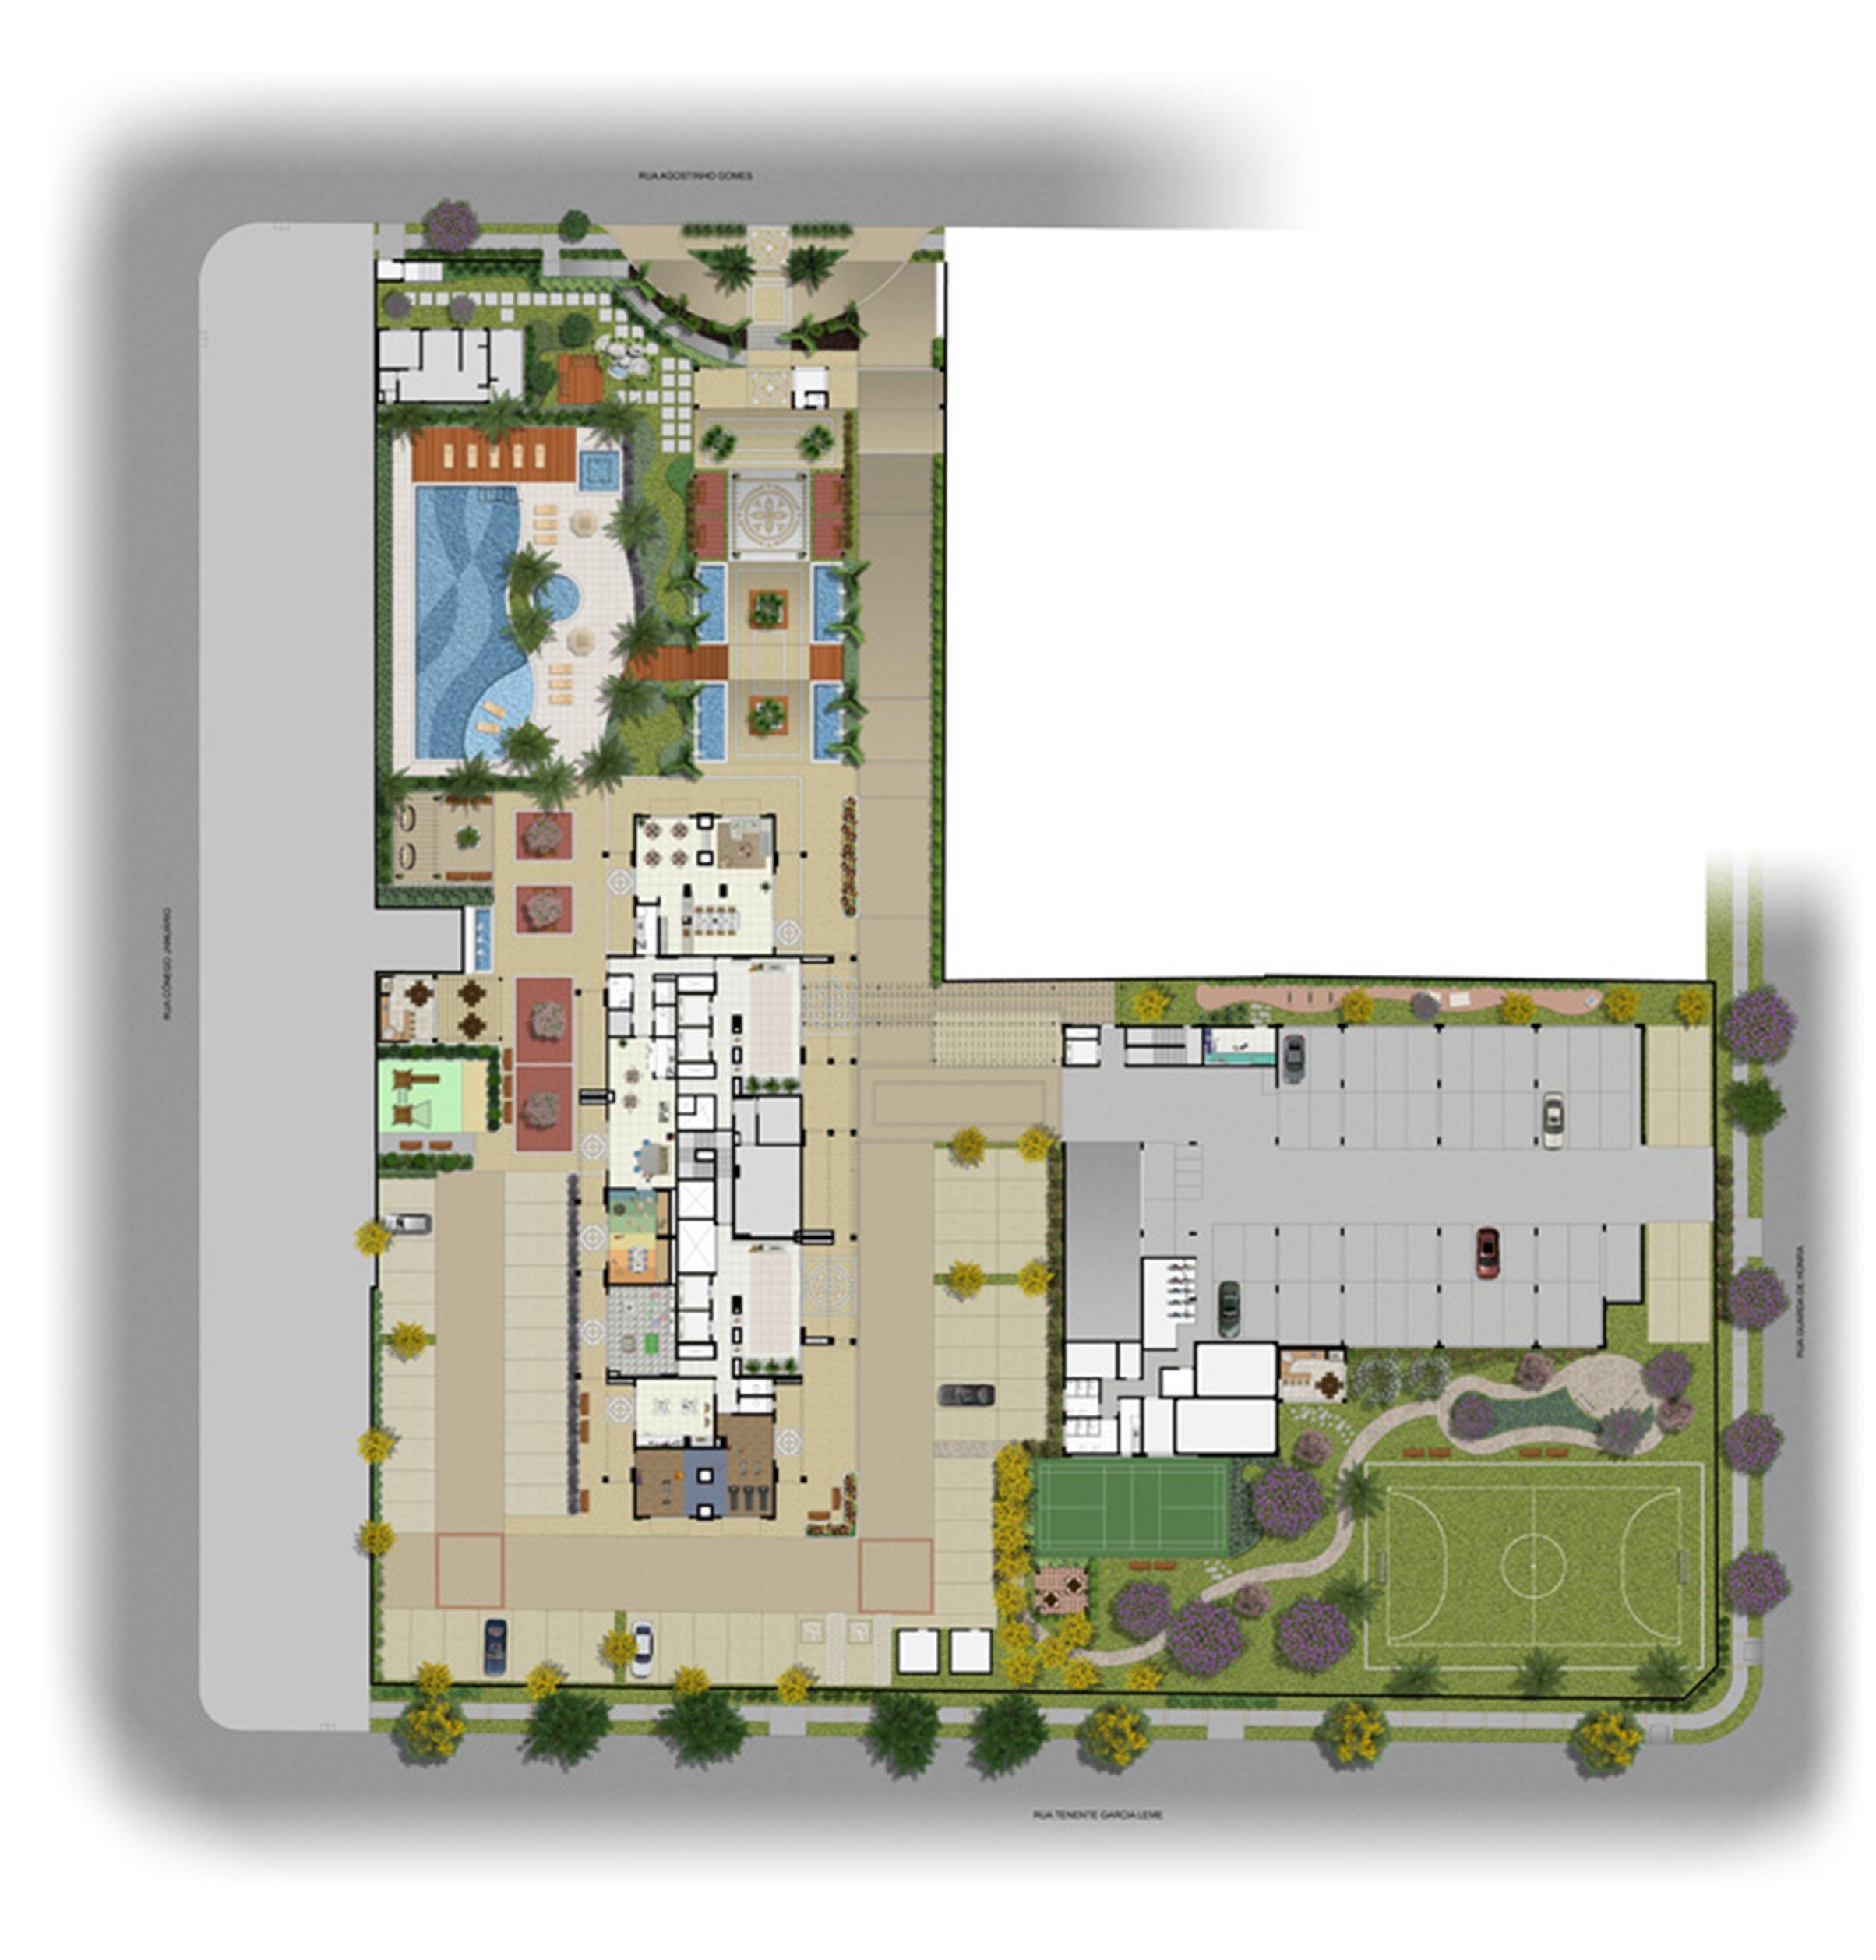 Implantação | Encontro Ipiranga – Apartamento no  Ipiranga - São Paulo - São Paulo